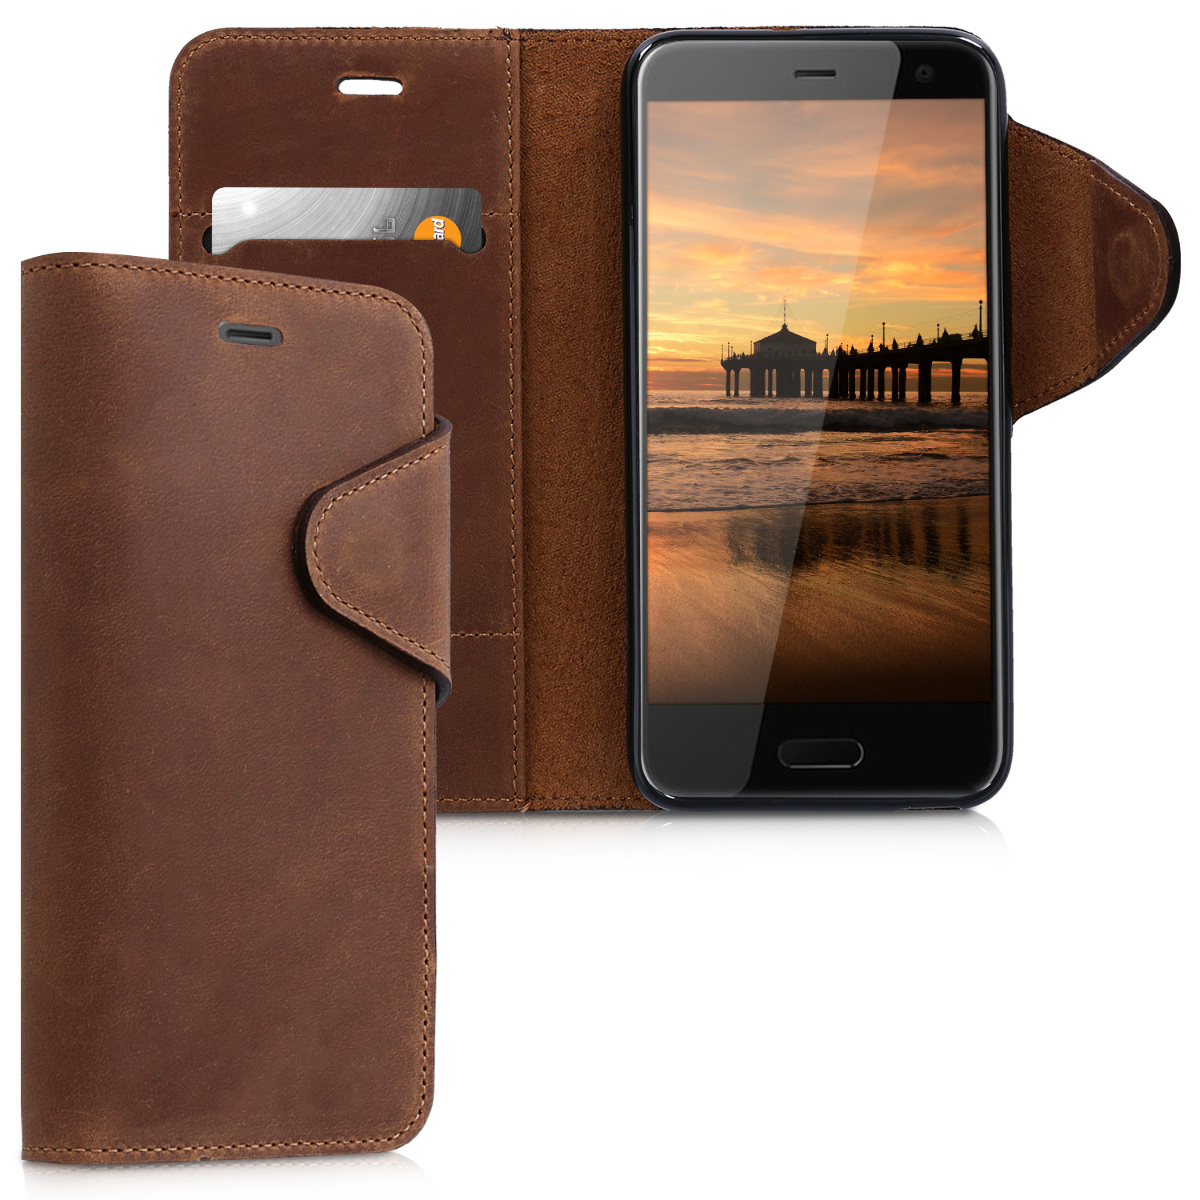 Kalibri Δερμάτινη Suede Θήκη - Πορτοφόλι HTC U11 Life - Καφέ (44191.05)